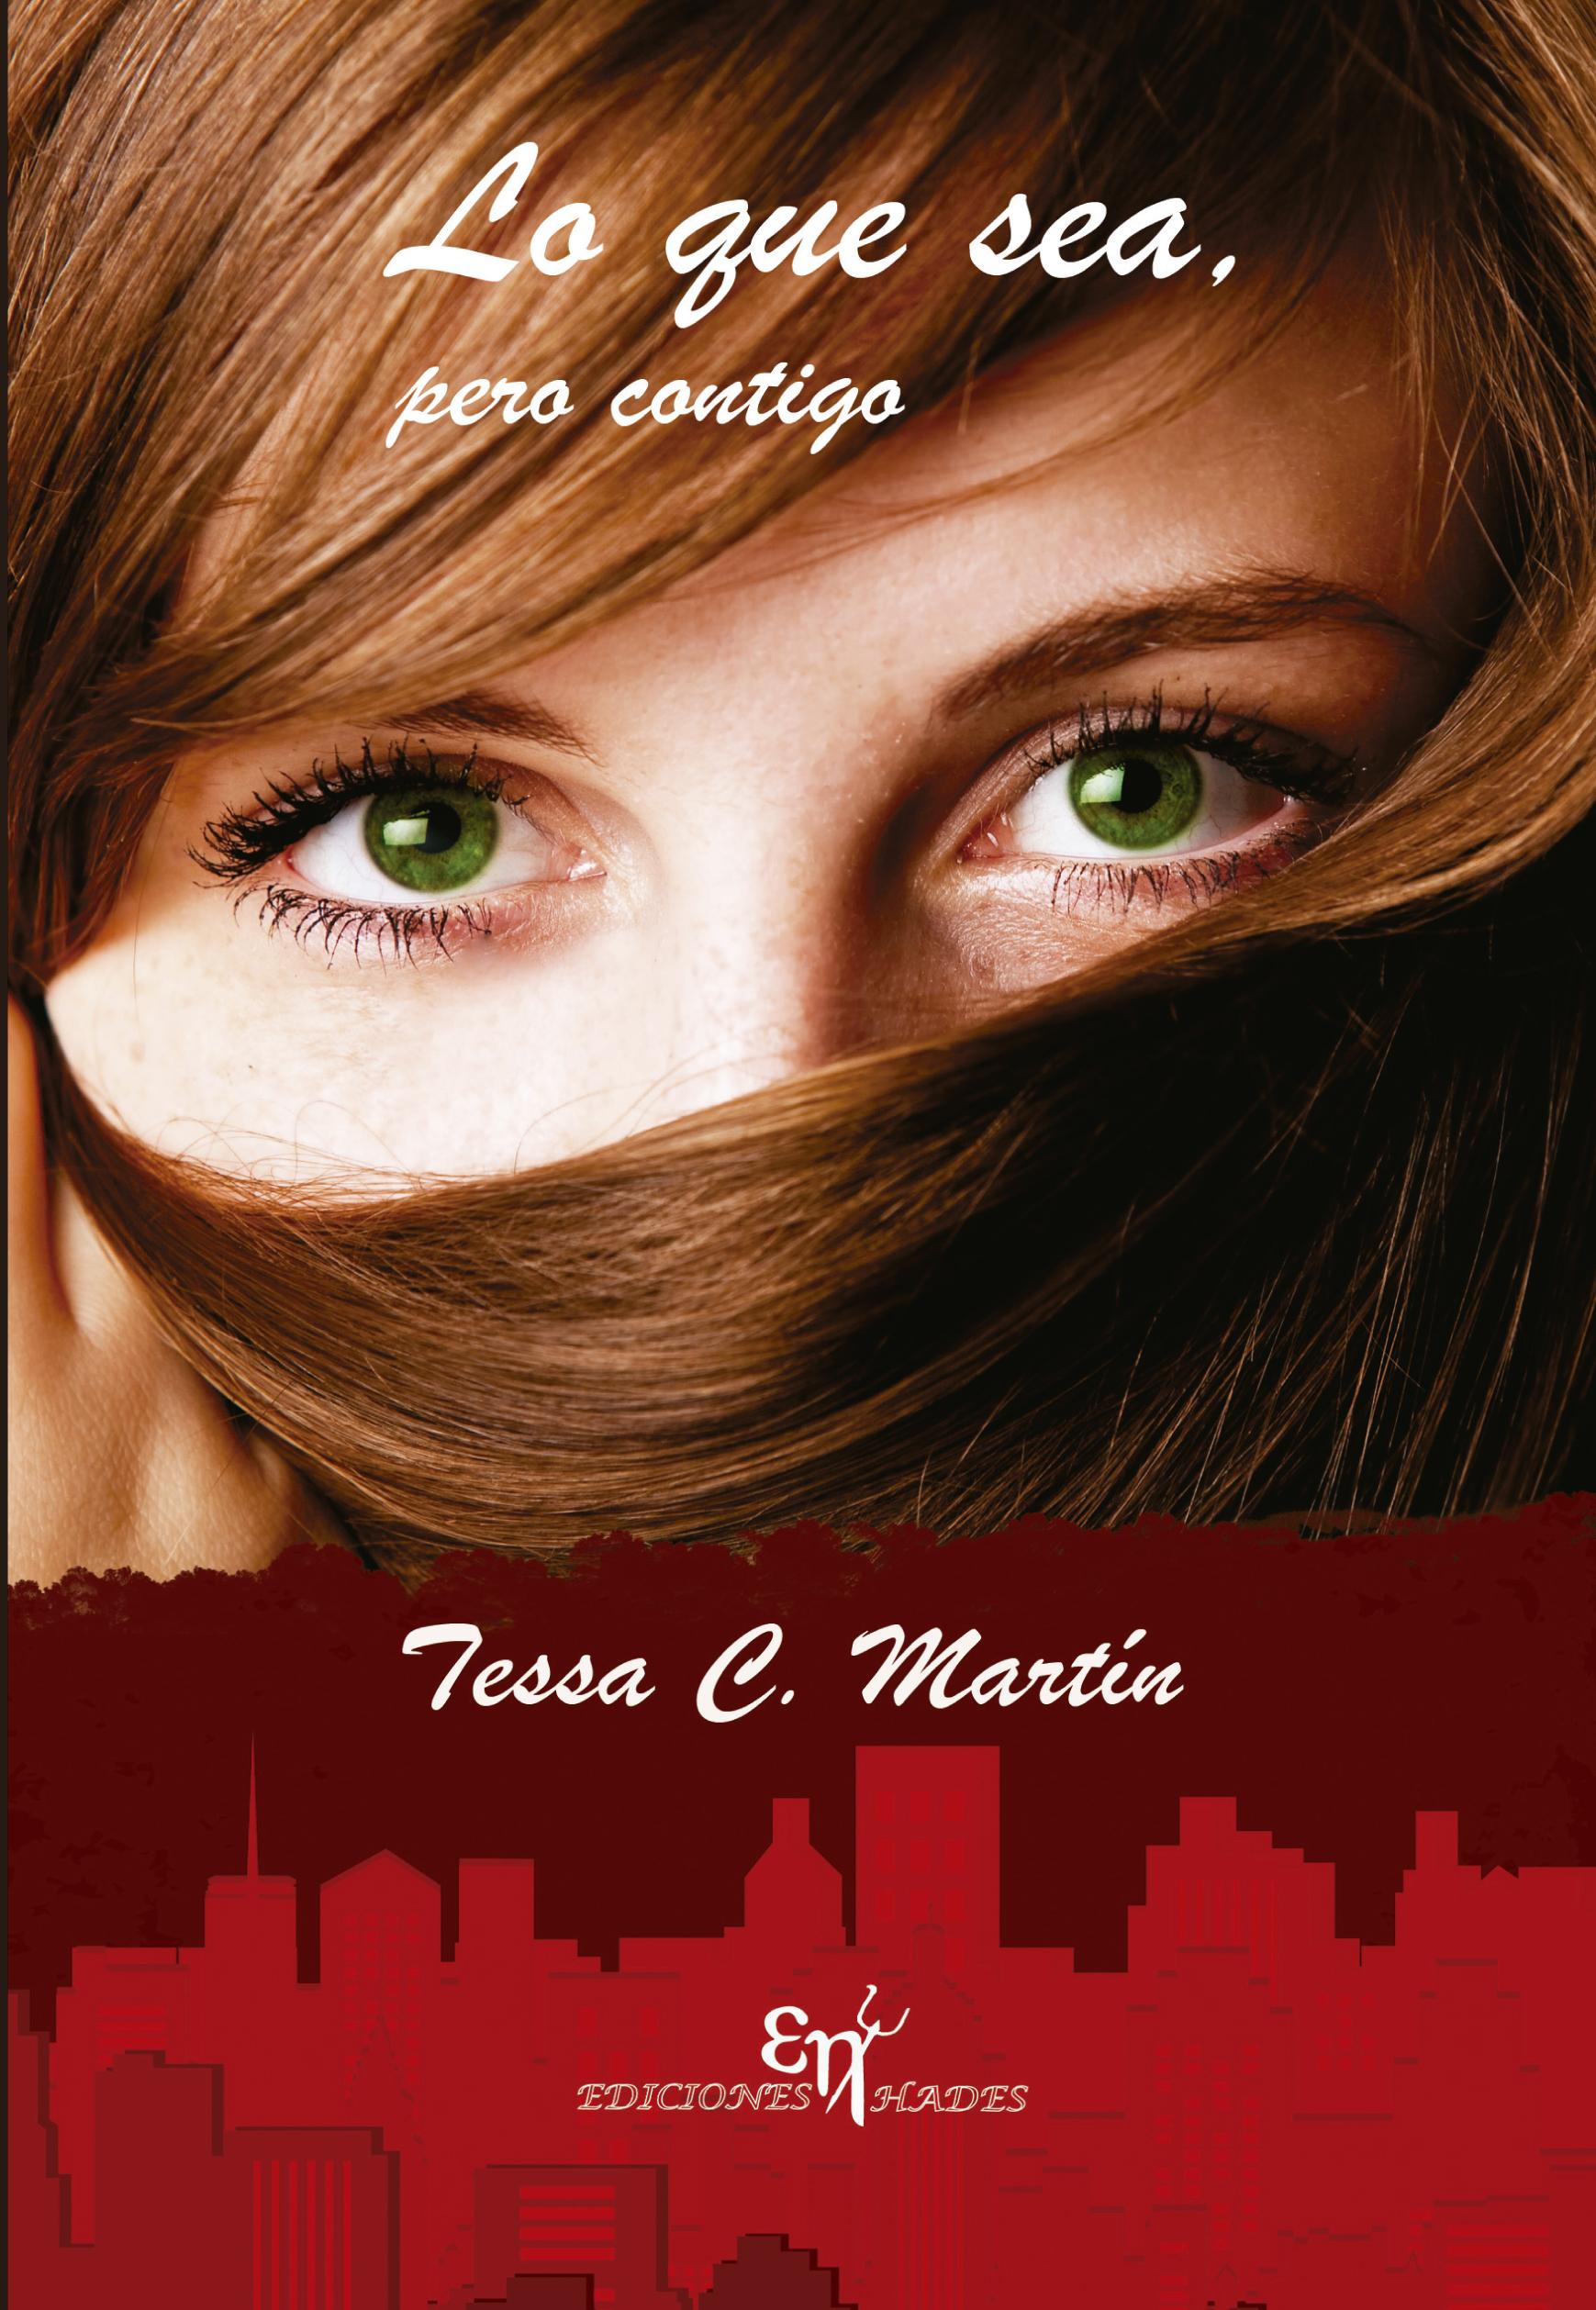 http://www.romanticamente.es/wp-content/uploads/2014/11/Portada-FB.-Lo-que-sea-pero-contigo-1.jpg